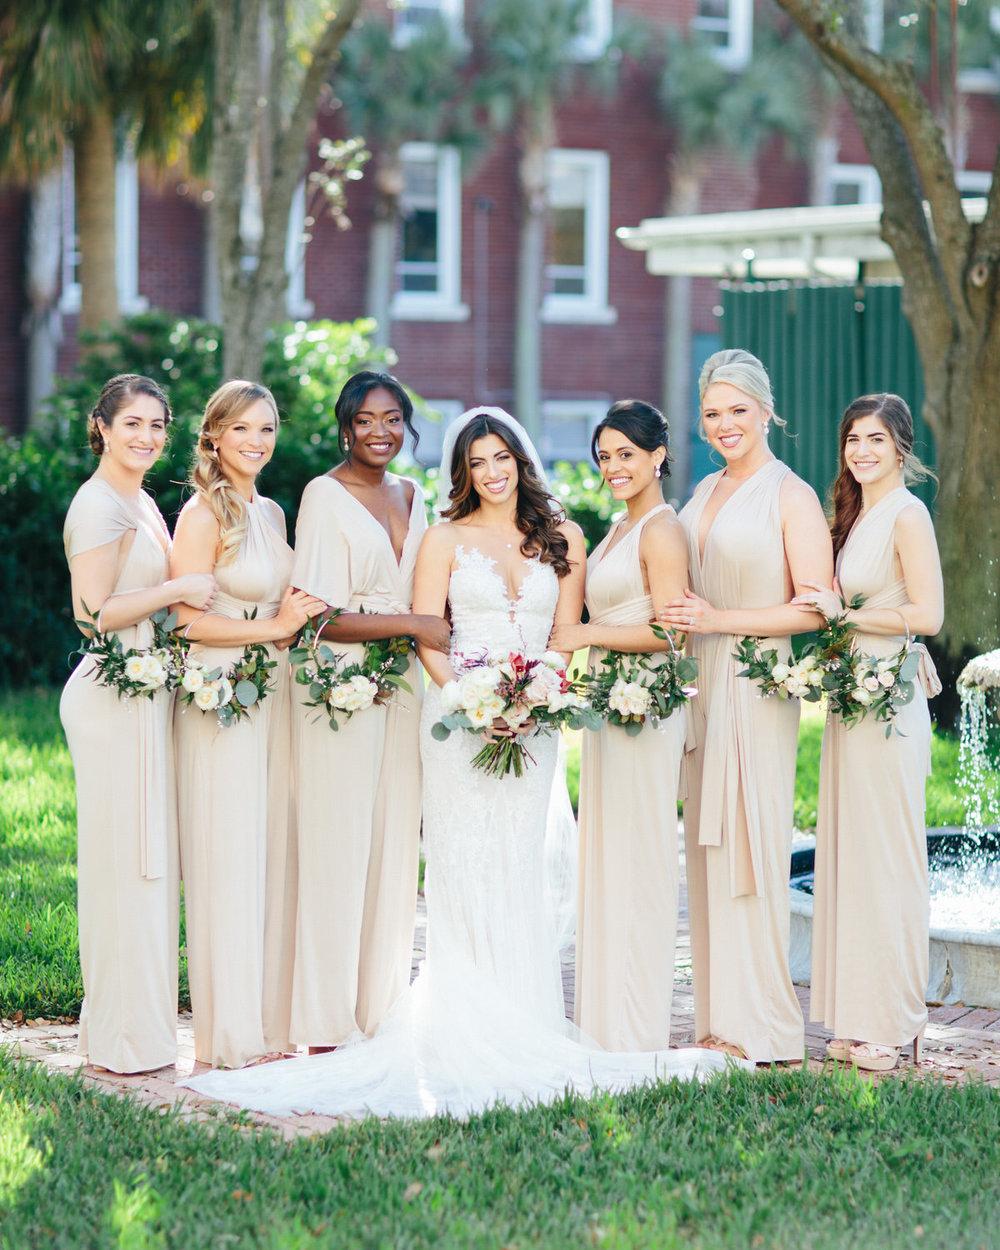 Outdoor bride with bridesmaids photos